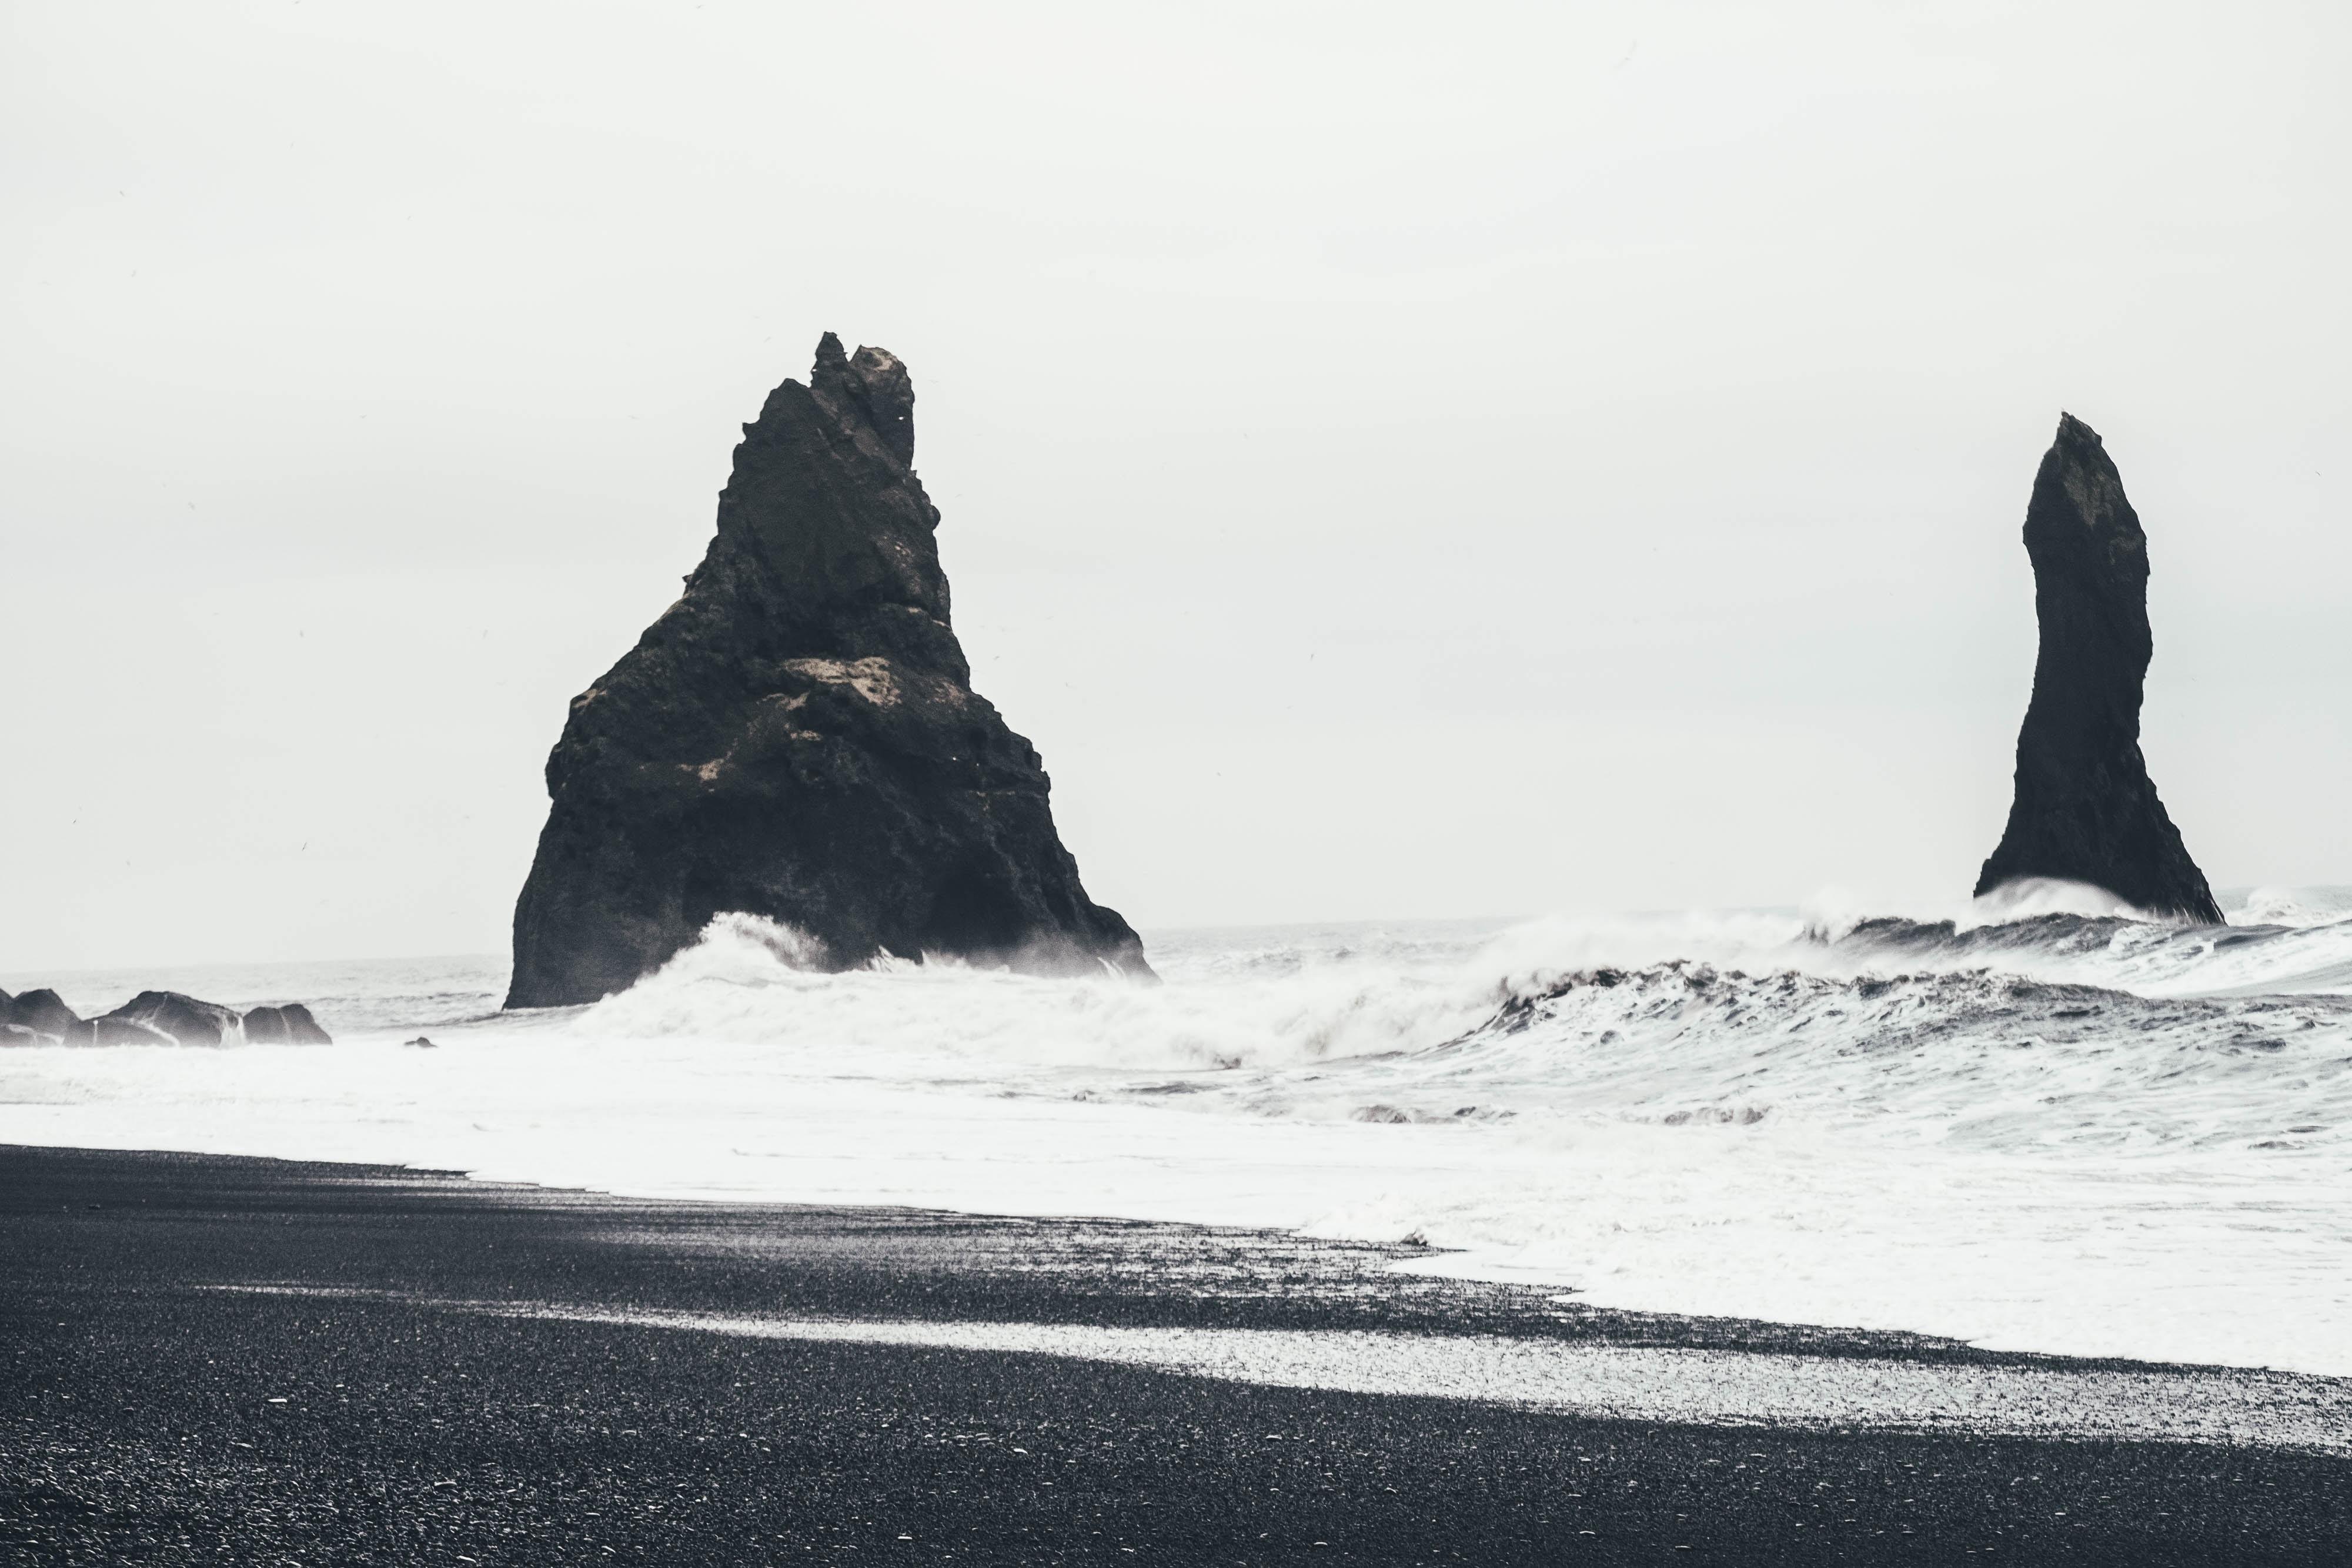 Rough sea splashing on rock formations by the black sand coastline at Reynisdrangar